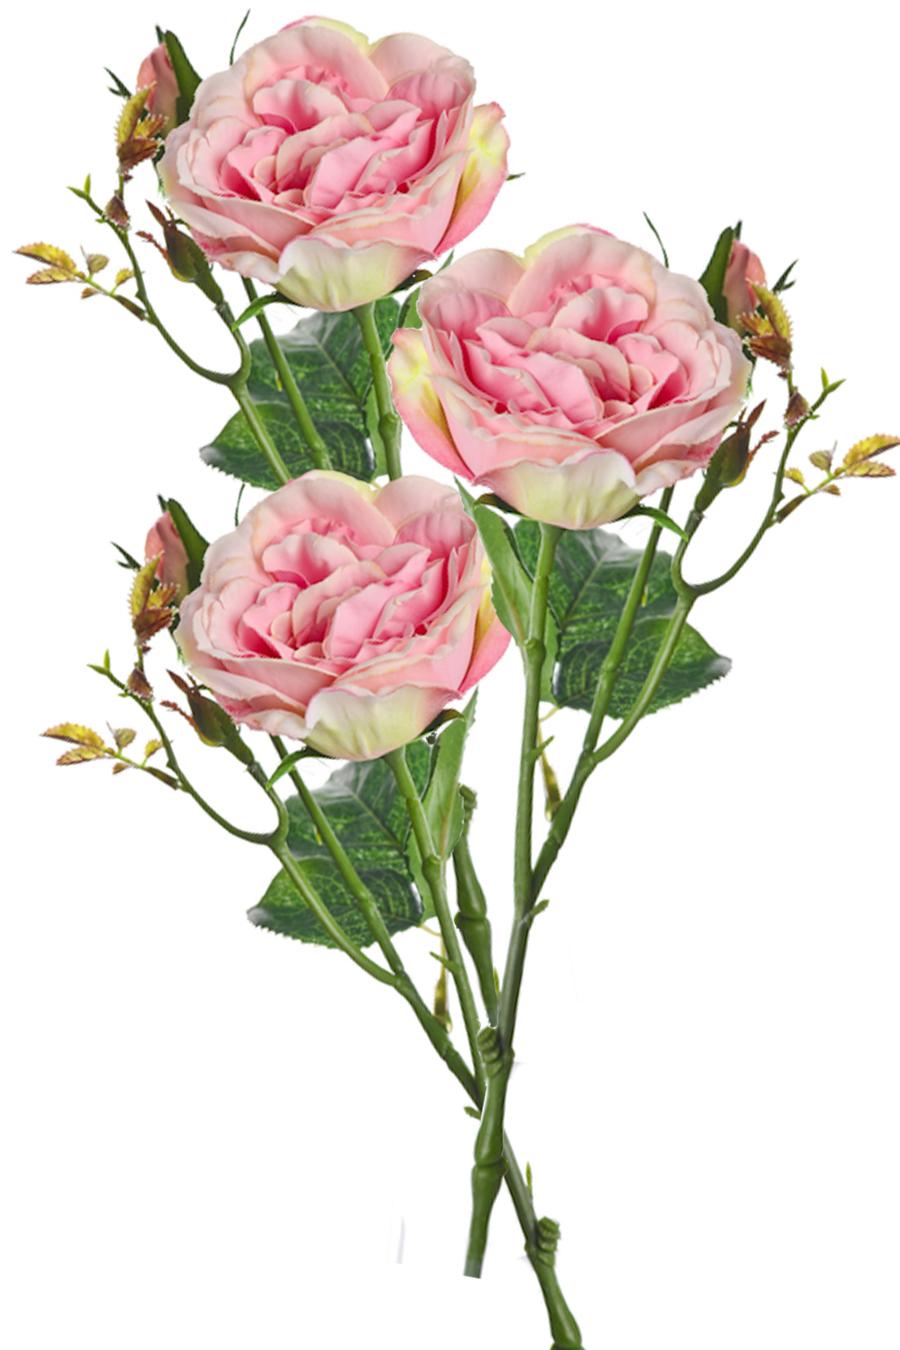 Rose Pale Pink 3 Silk Flowers  Artificial Arrangements  Pene Dene Flowers